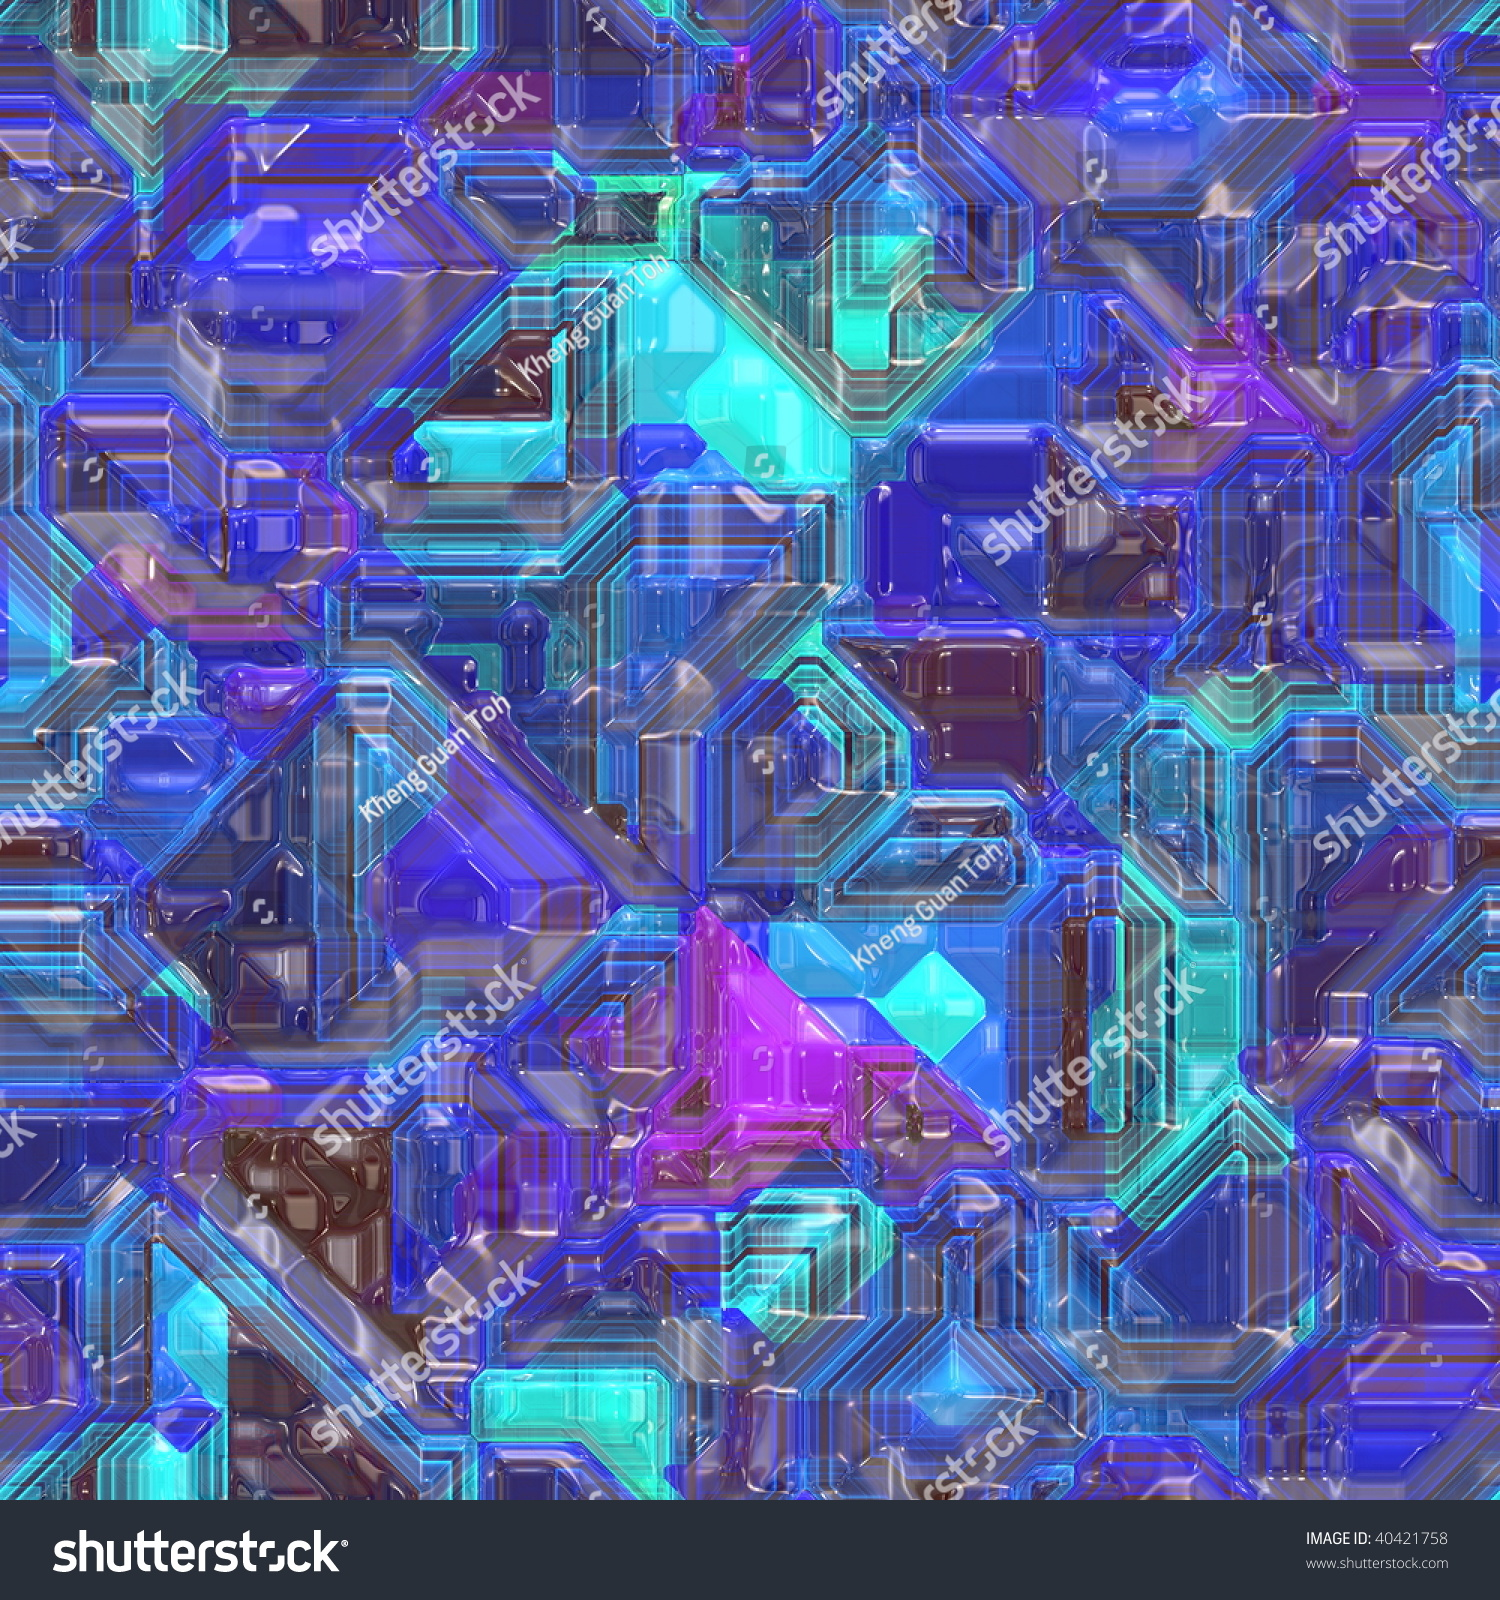 Circuitry Background By Onetooneandonto On Deviantart Eydt I Free